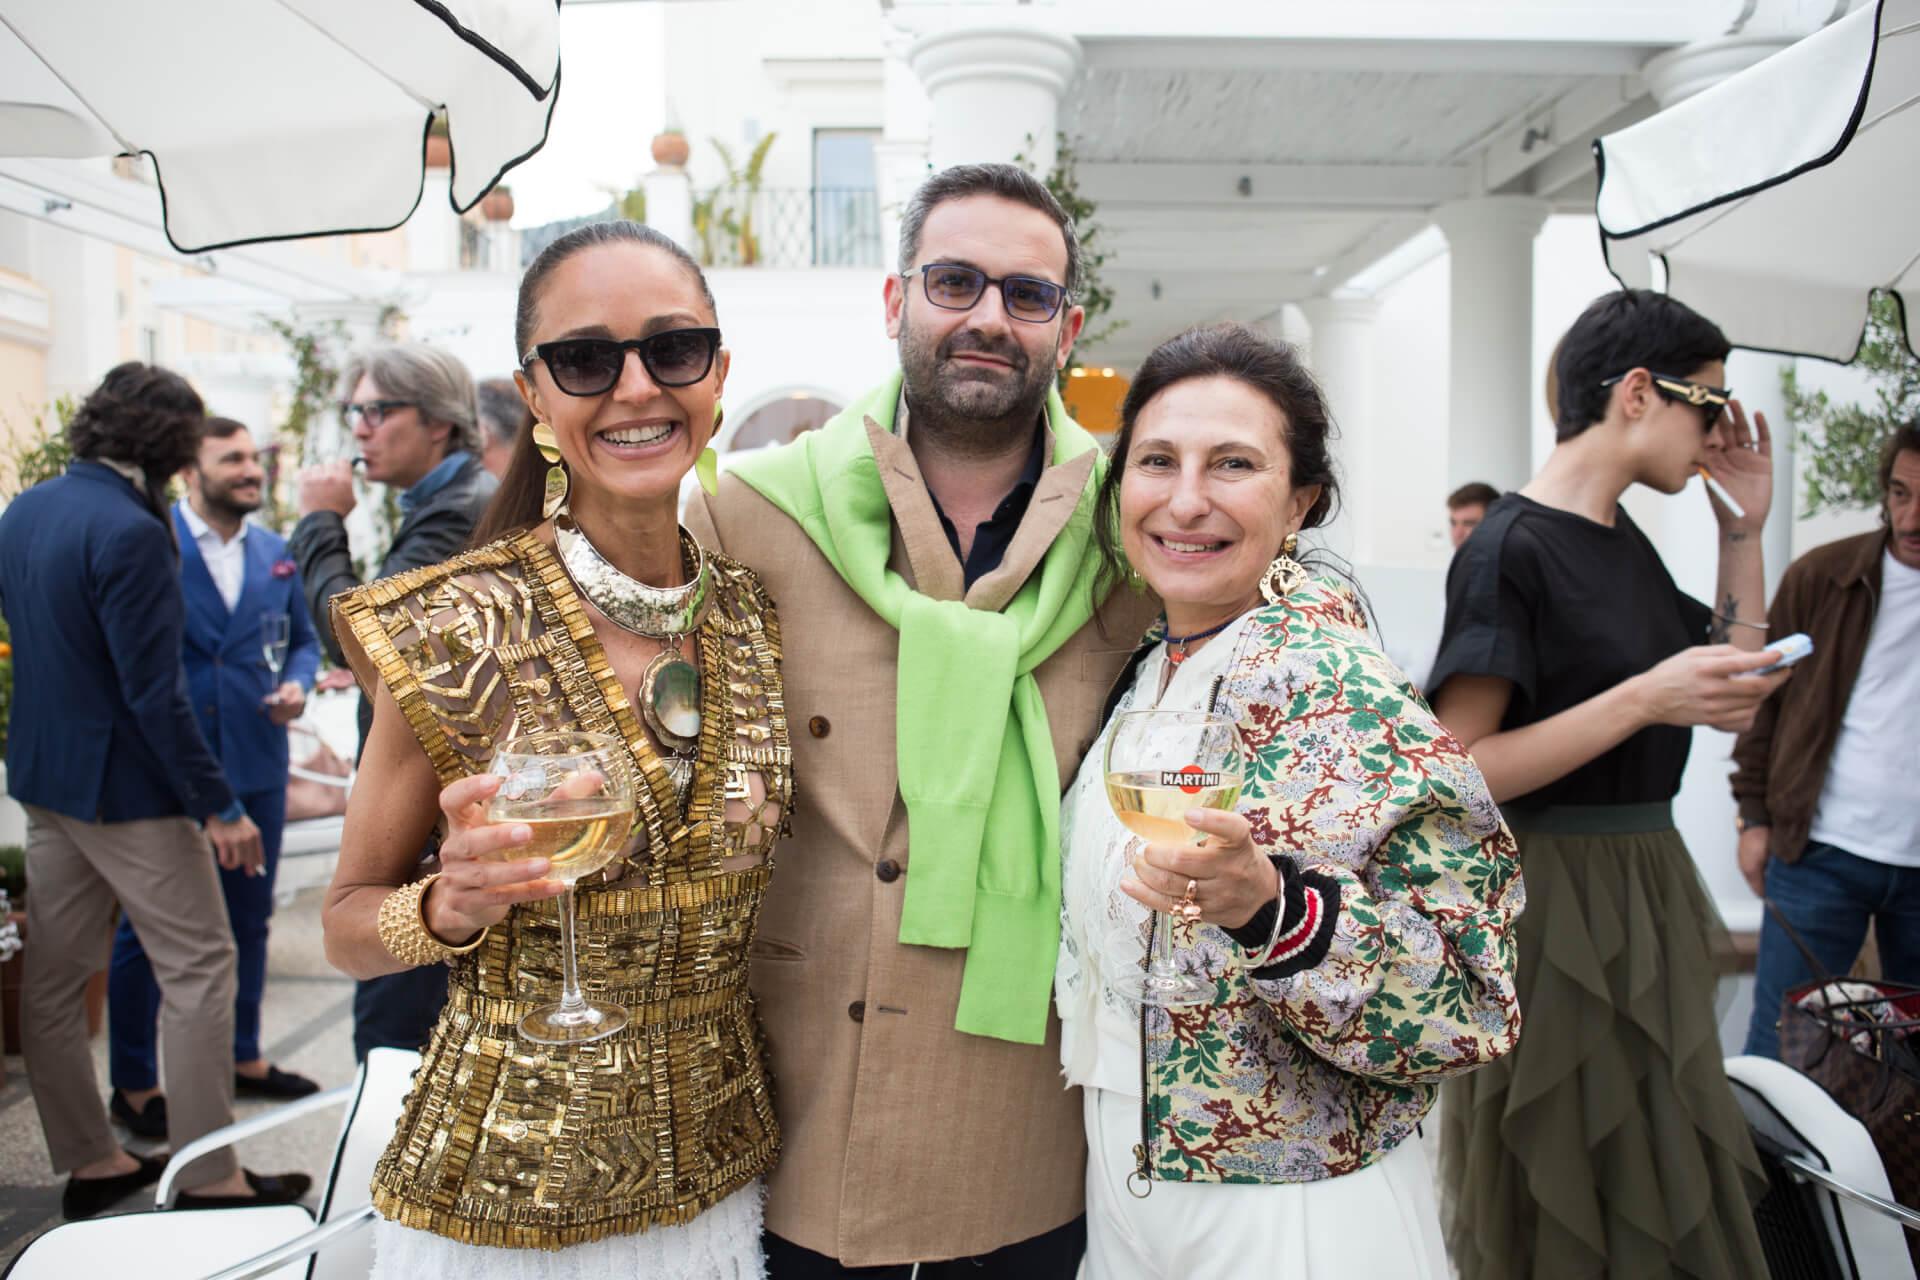 Luna de Casanova, Fabio Filippi, Maria Elena Aprea